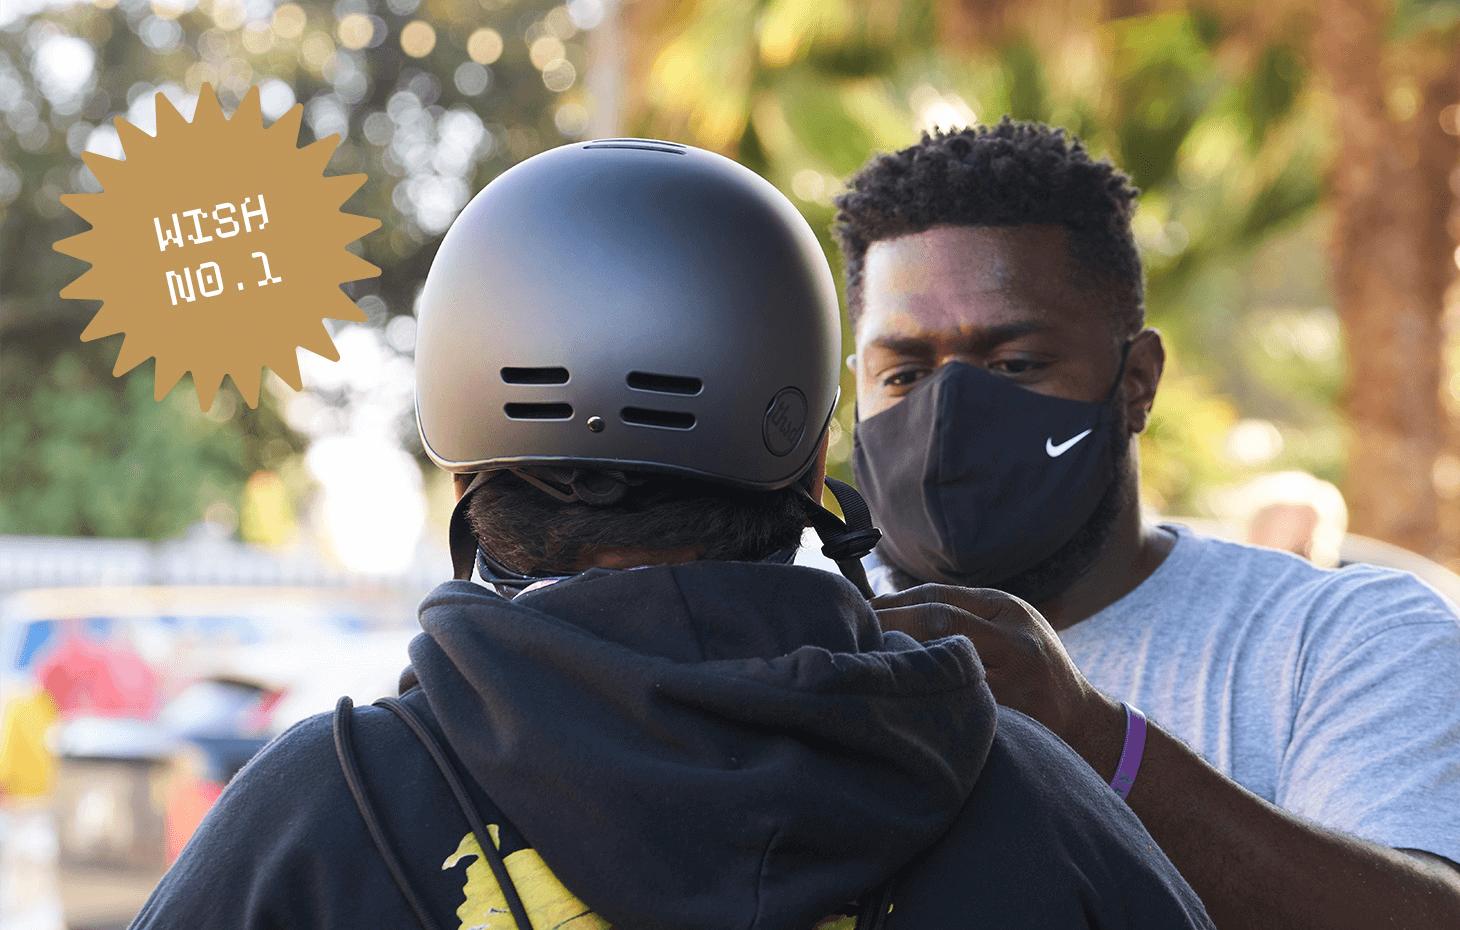 John J. helping someone try on a black bike helmet.